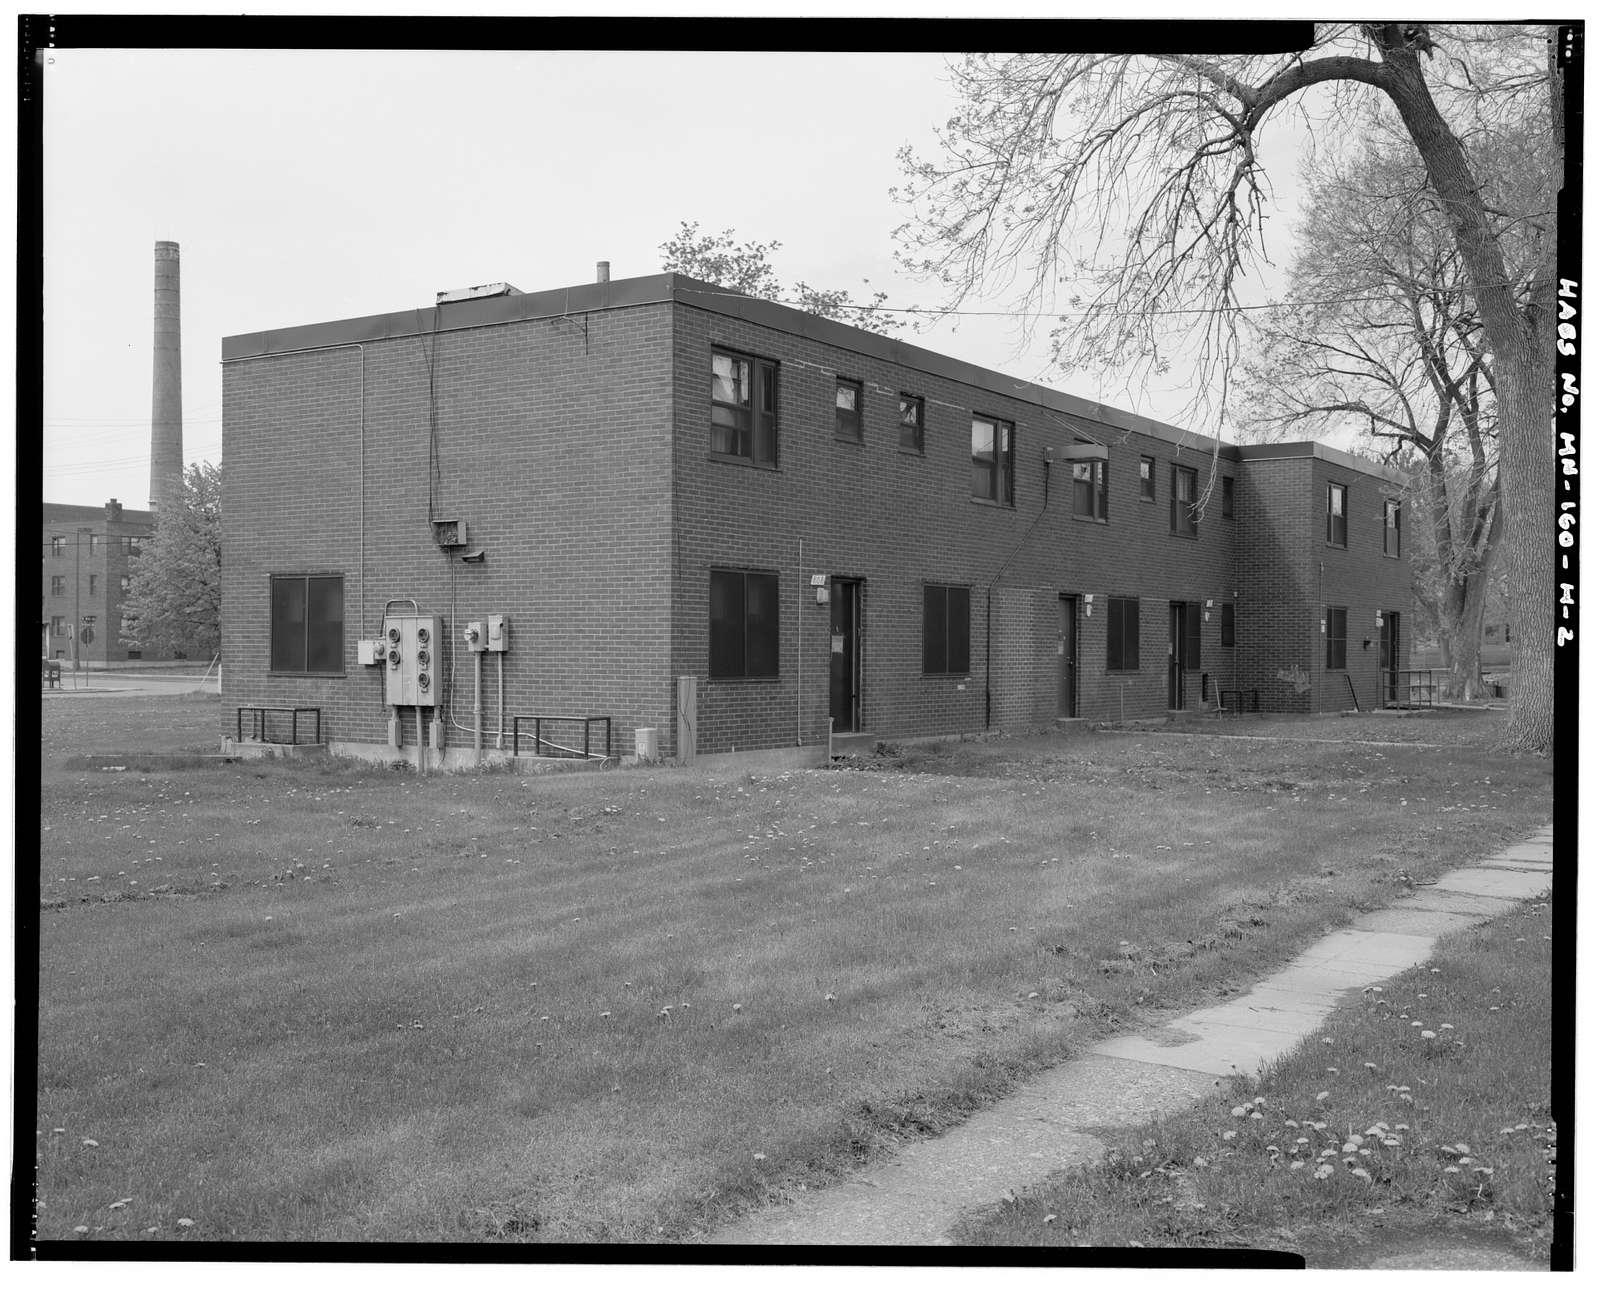 Sumner Field Homes, Building E-14, 808-820 North Bryant Avenue, Minneapolis, Hennepin County, MN